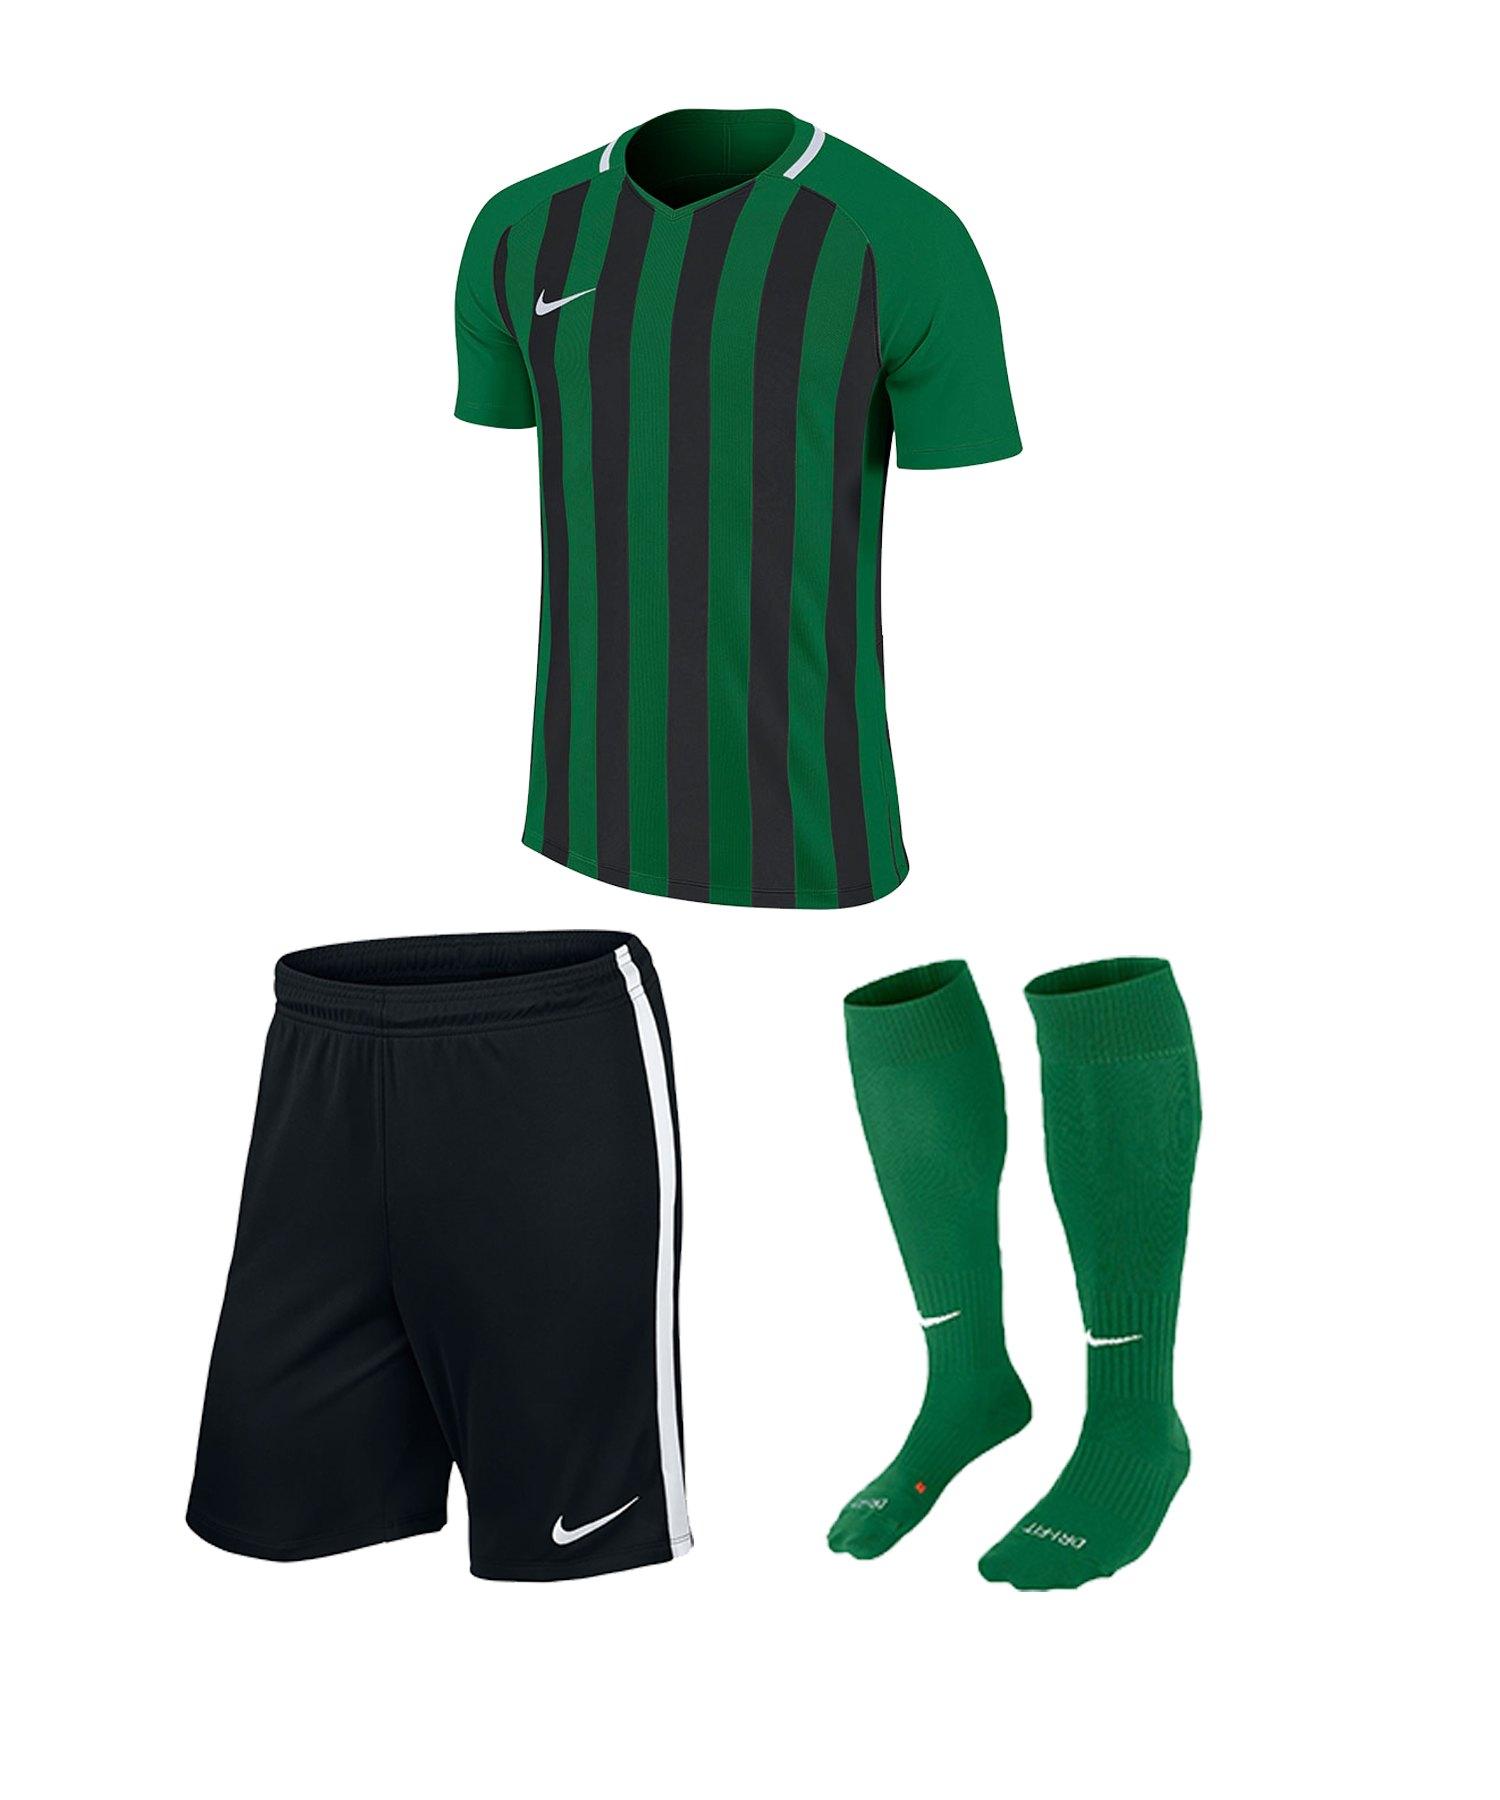 Nike Striped Division III Trikotset kurz Kids F302 - gruen